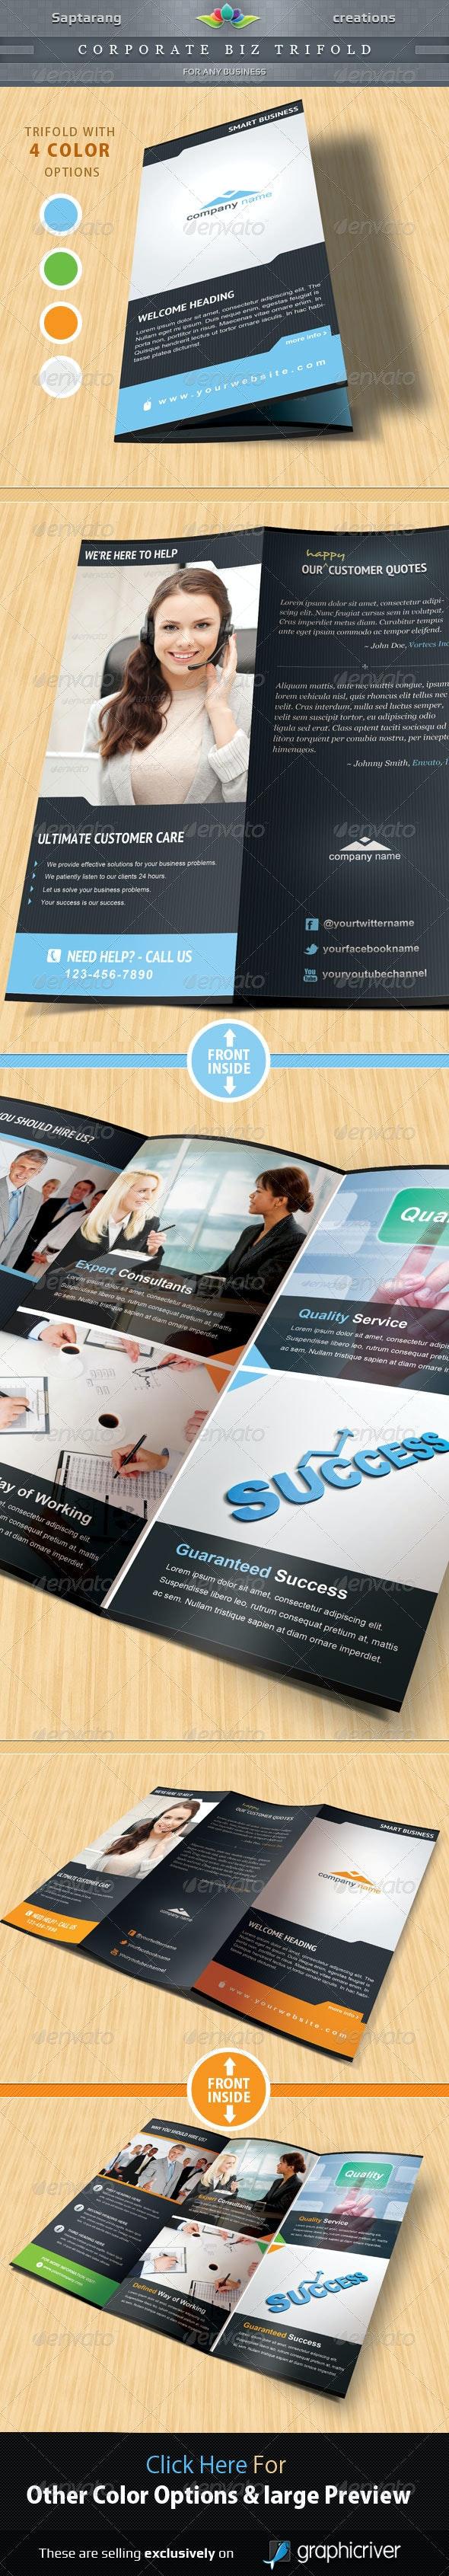 Corporate Biz Trifold Brochure - Corporate Brochures